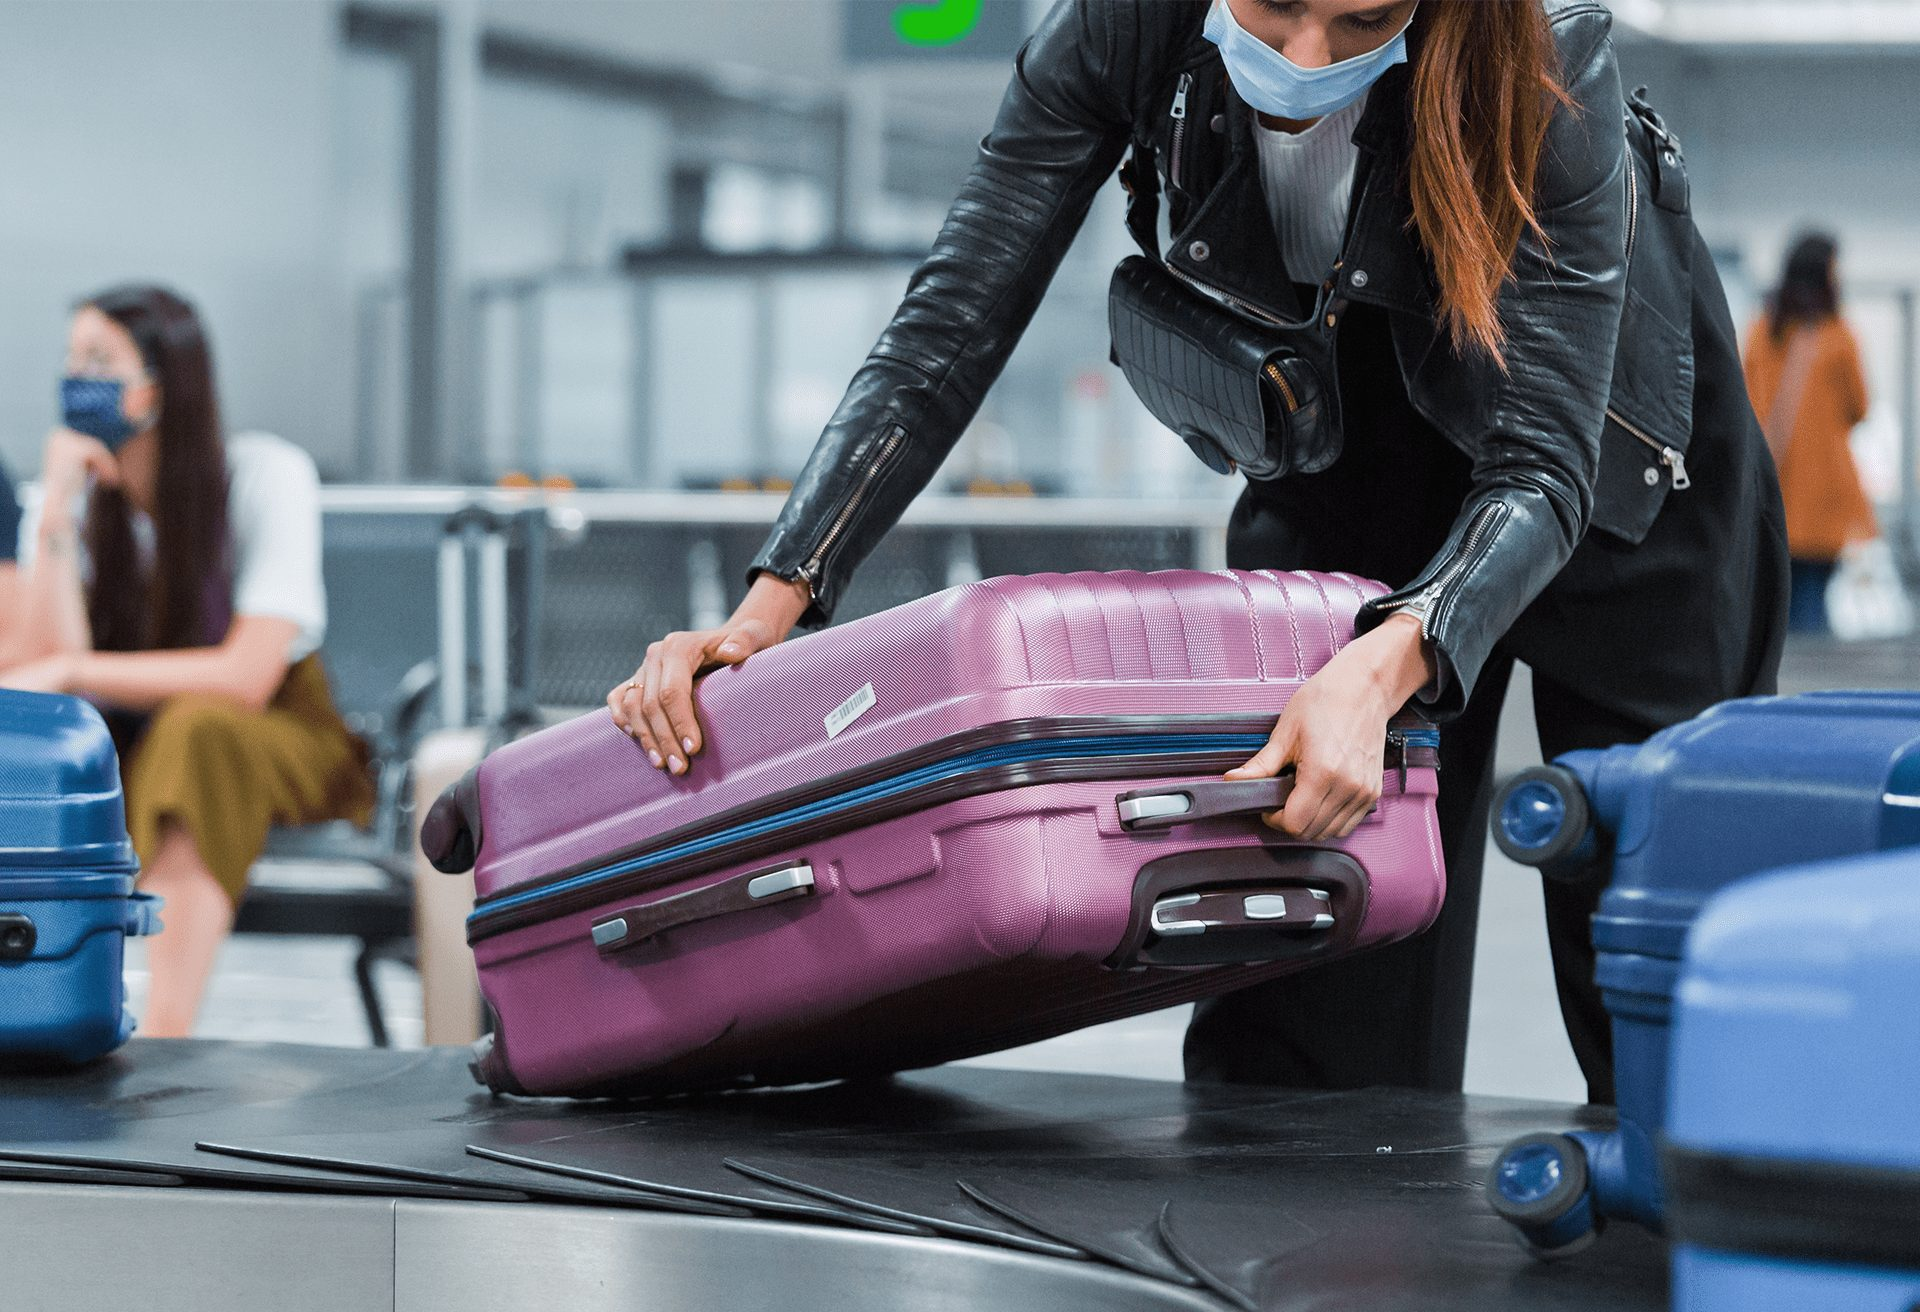 Tips for flying during COVID-19 -- KAYAK Travel Hacker Blog